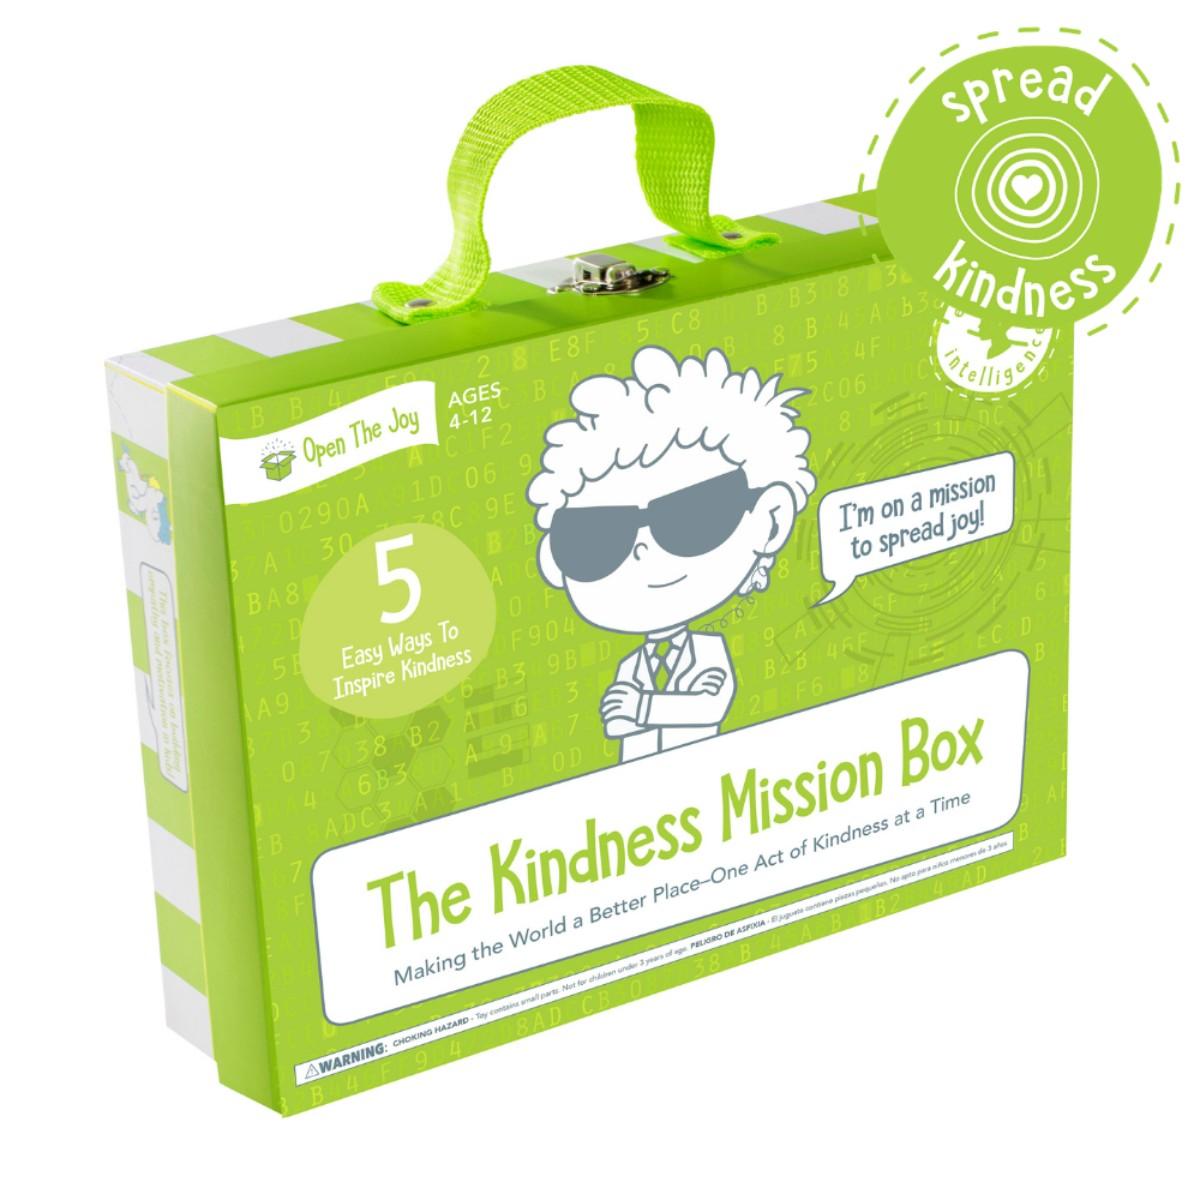 The Kindness Missions Box